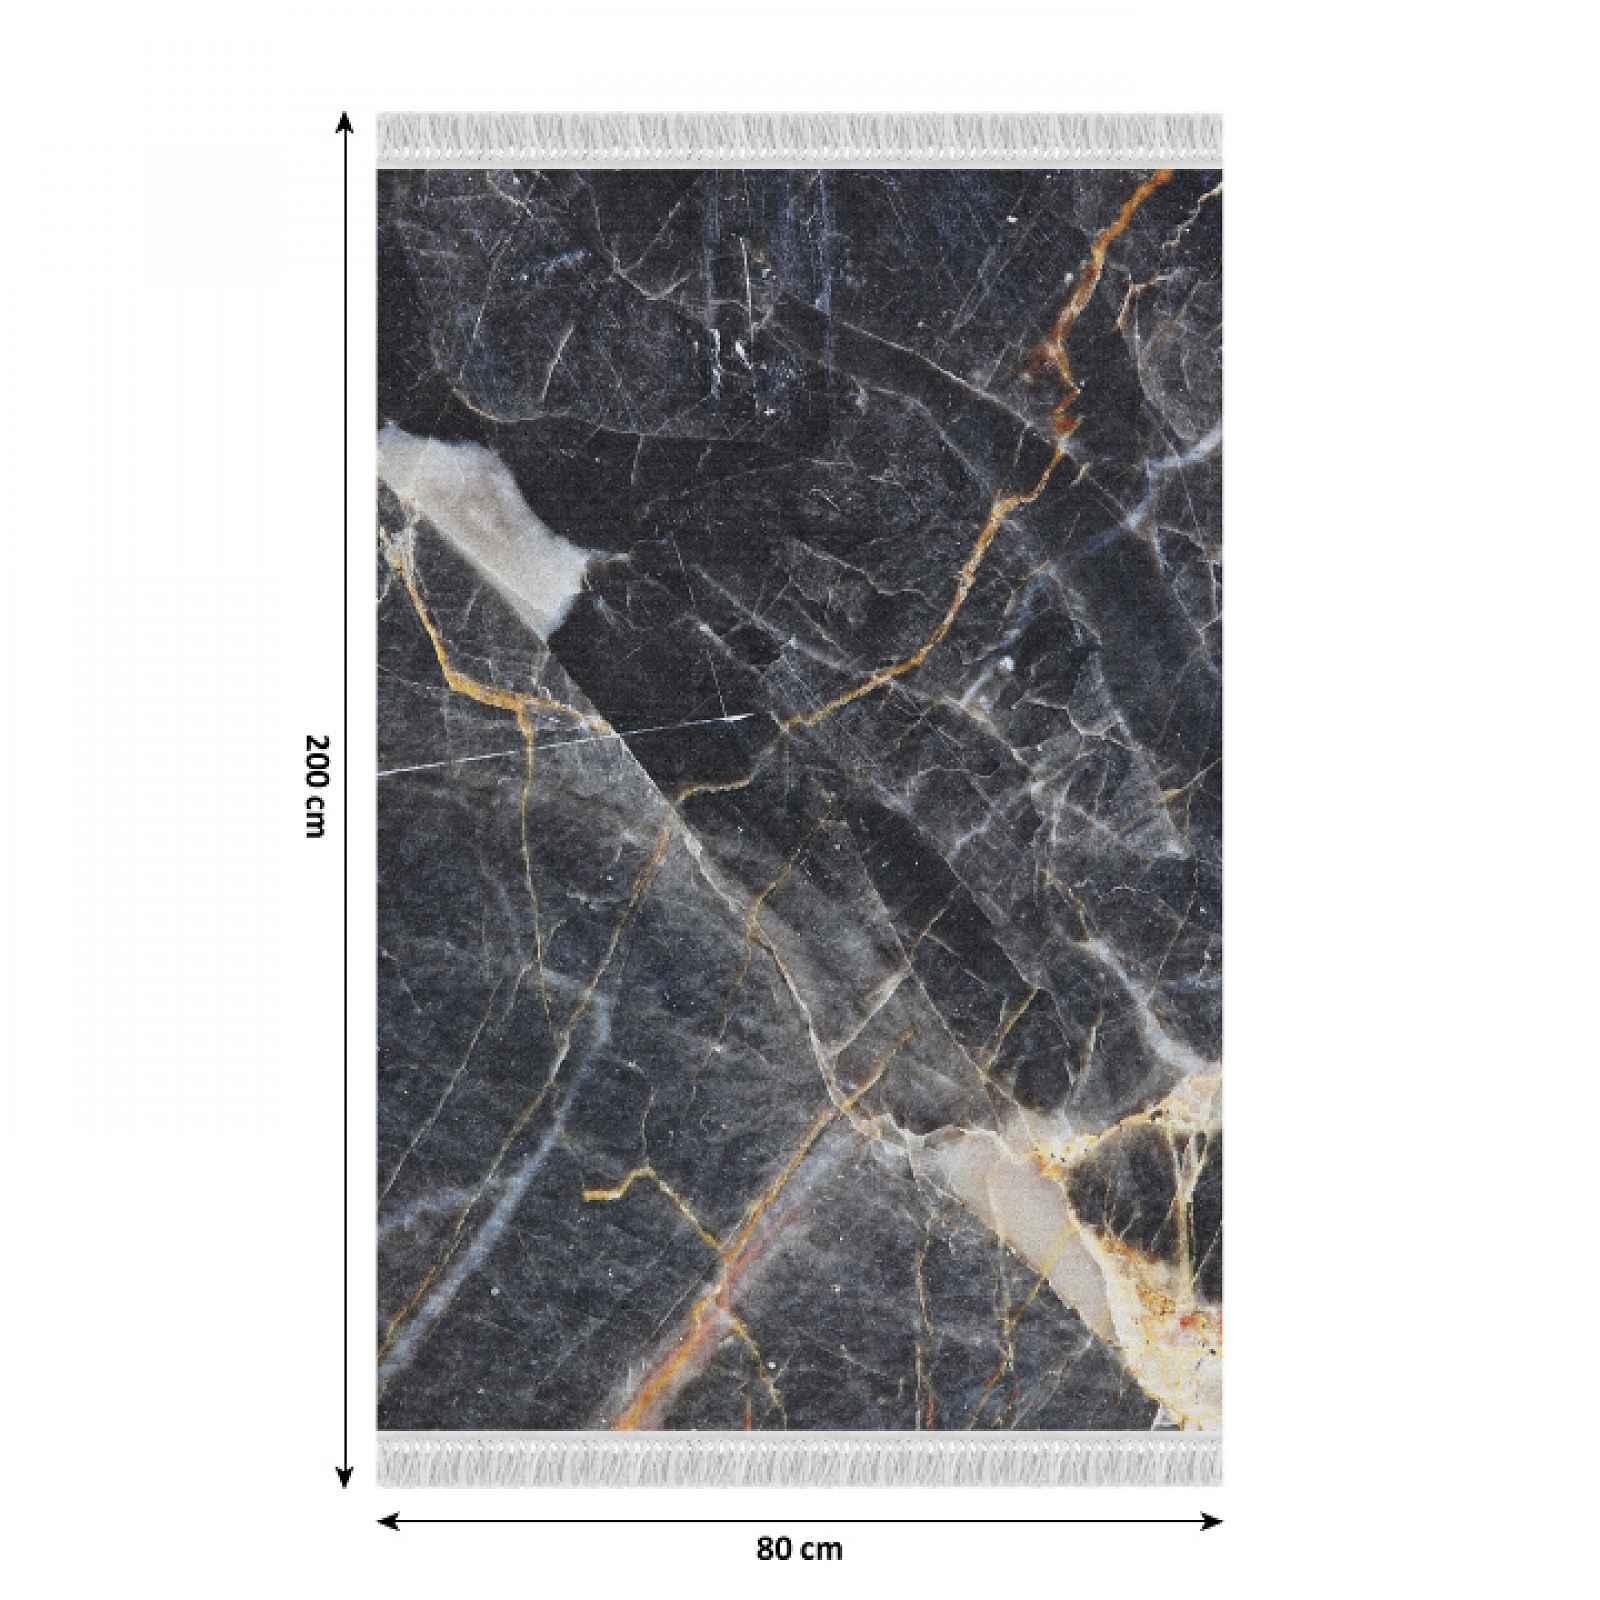 Koberec s třásněmi RENOX TYP 1 černý mramor Tempo Kondela 80x200 cm